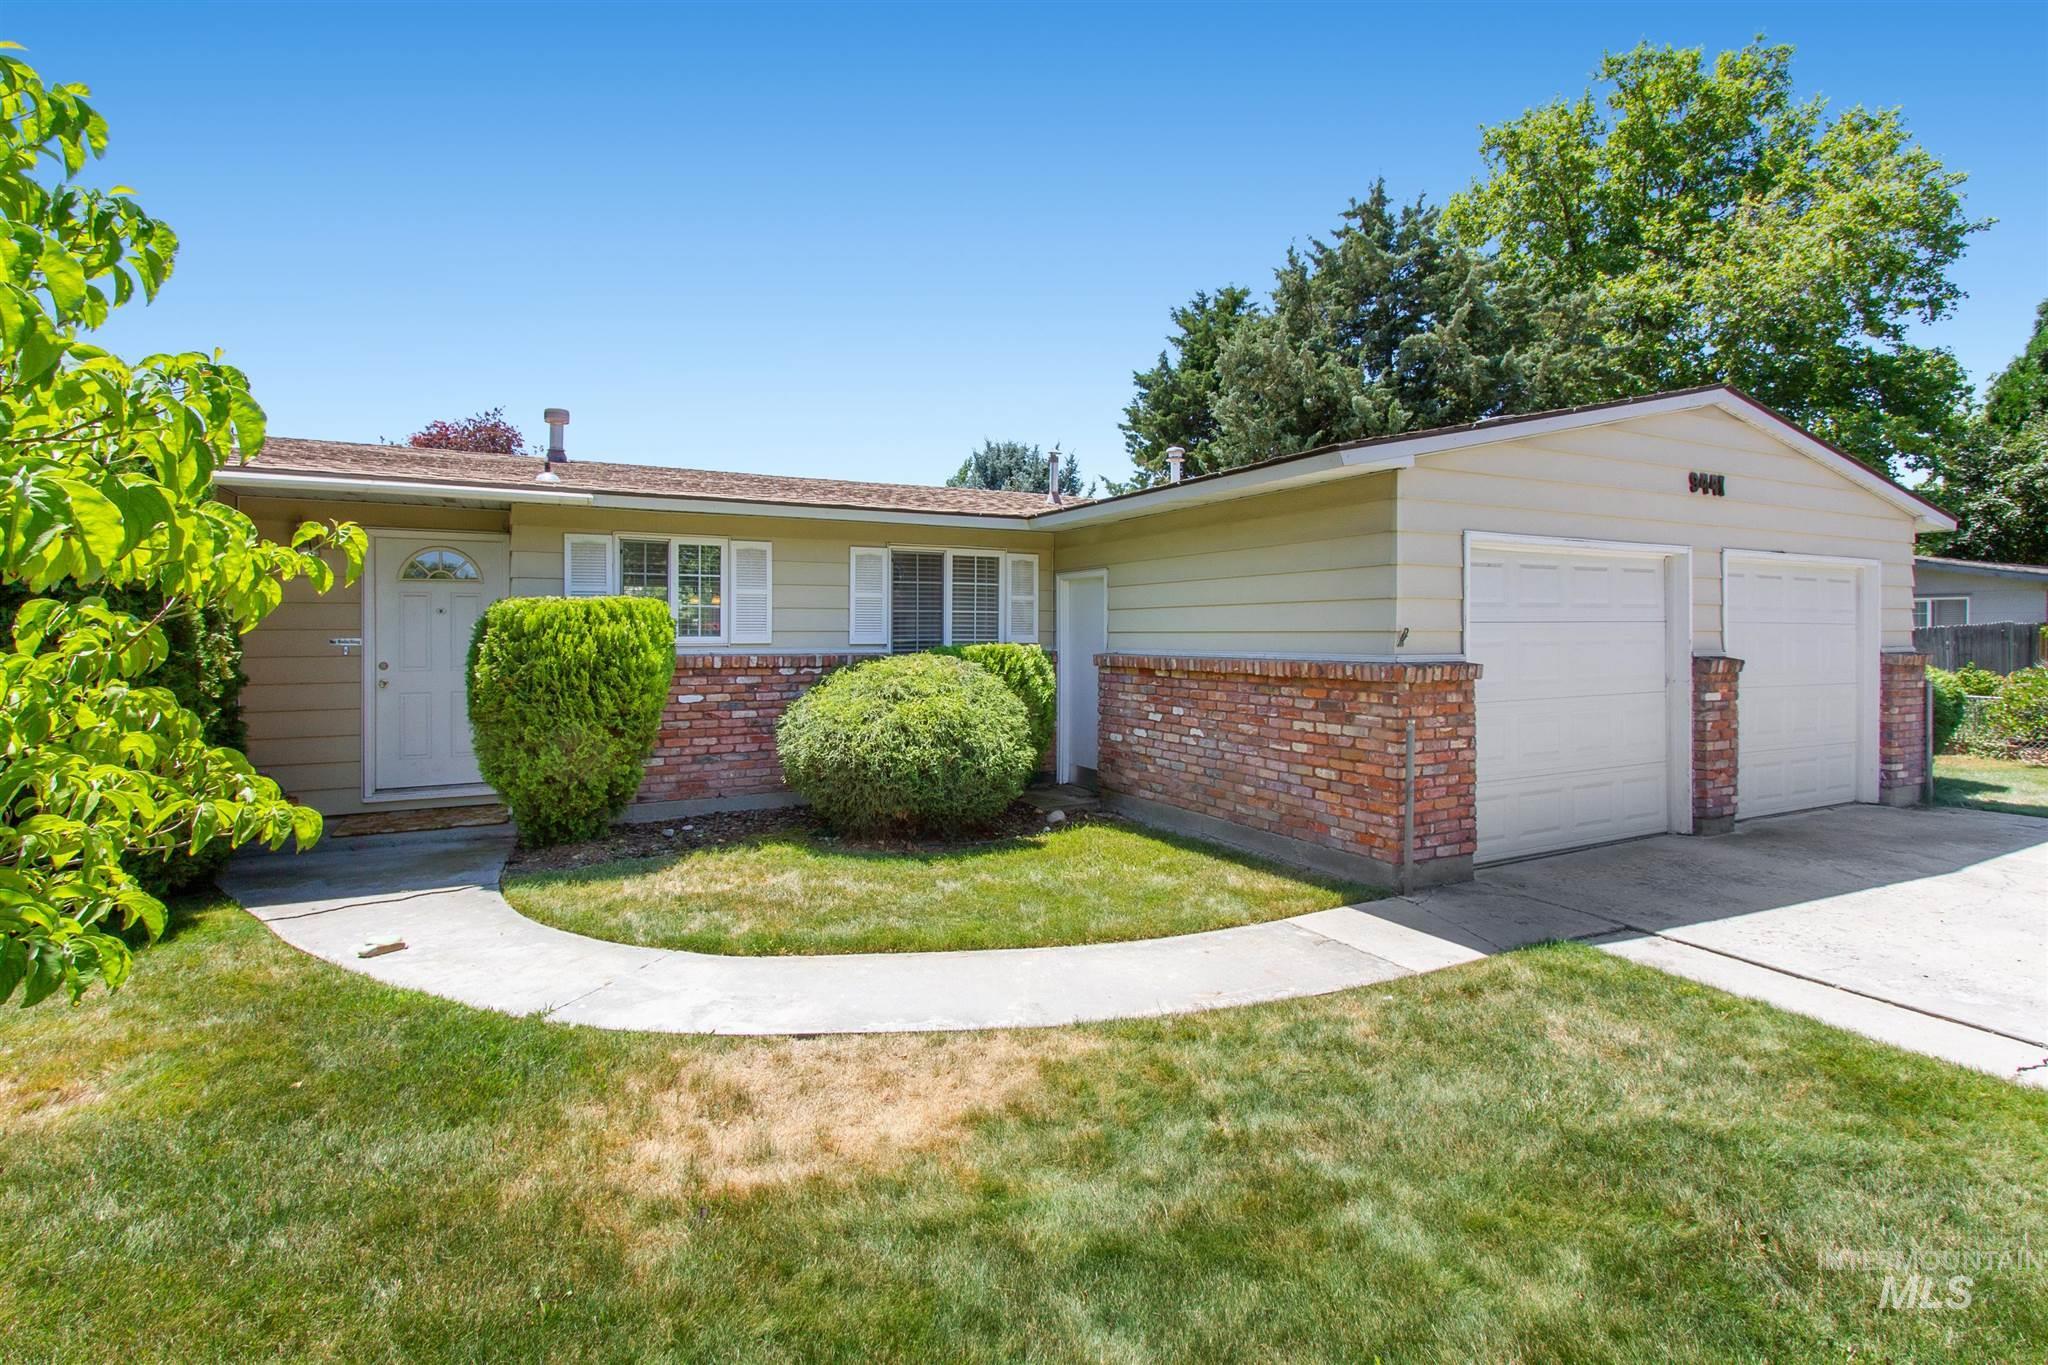 9441 W Halstead Dr Property Photo